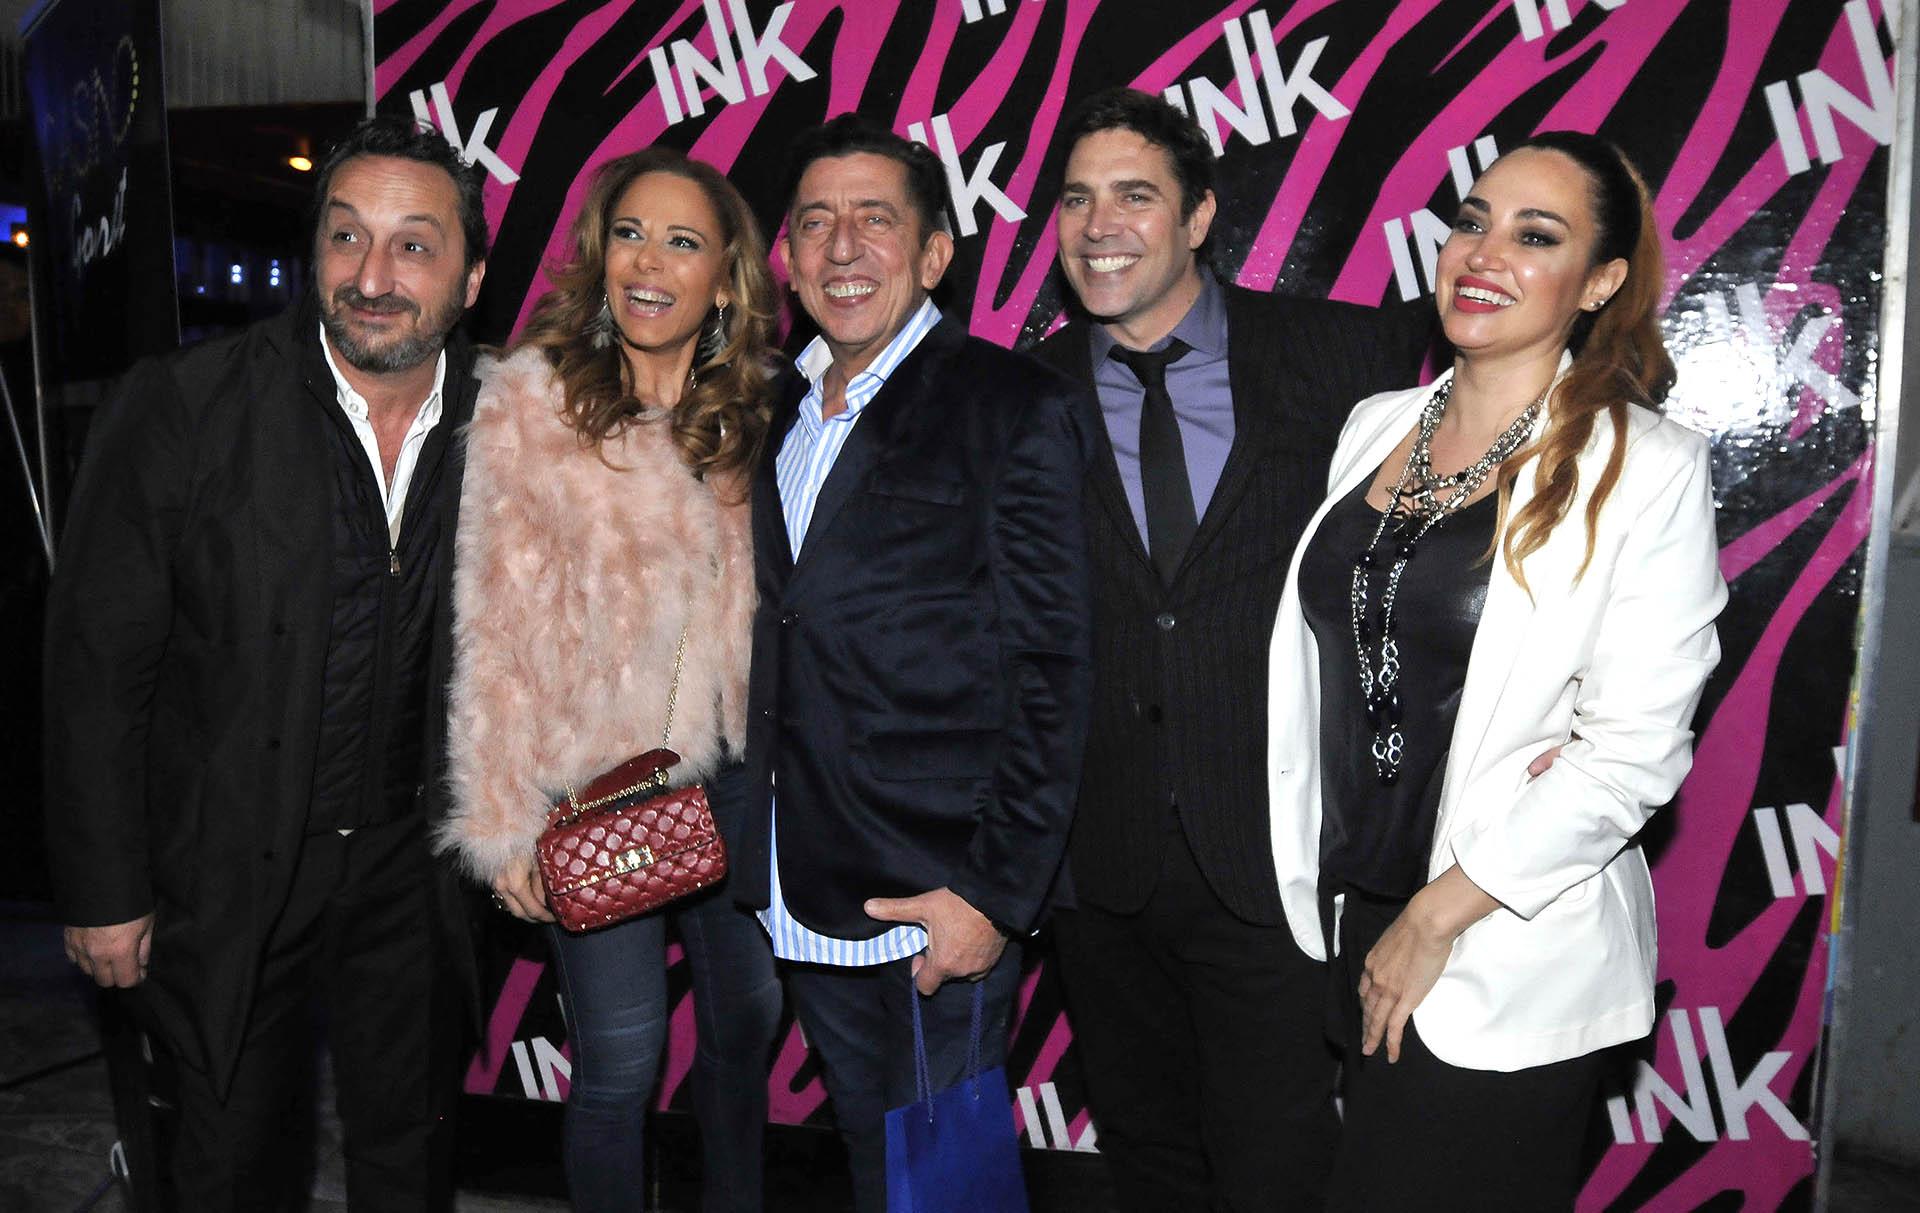 Belén Francese, Matías Alé, Huevo Müller, Iliana Calabró y su pareja